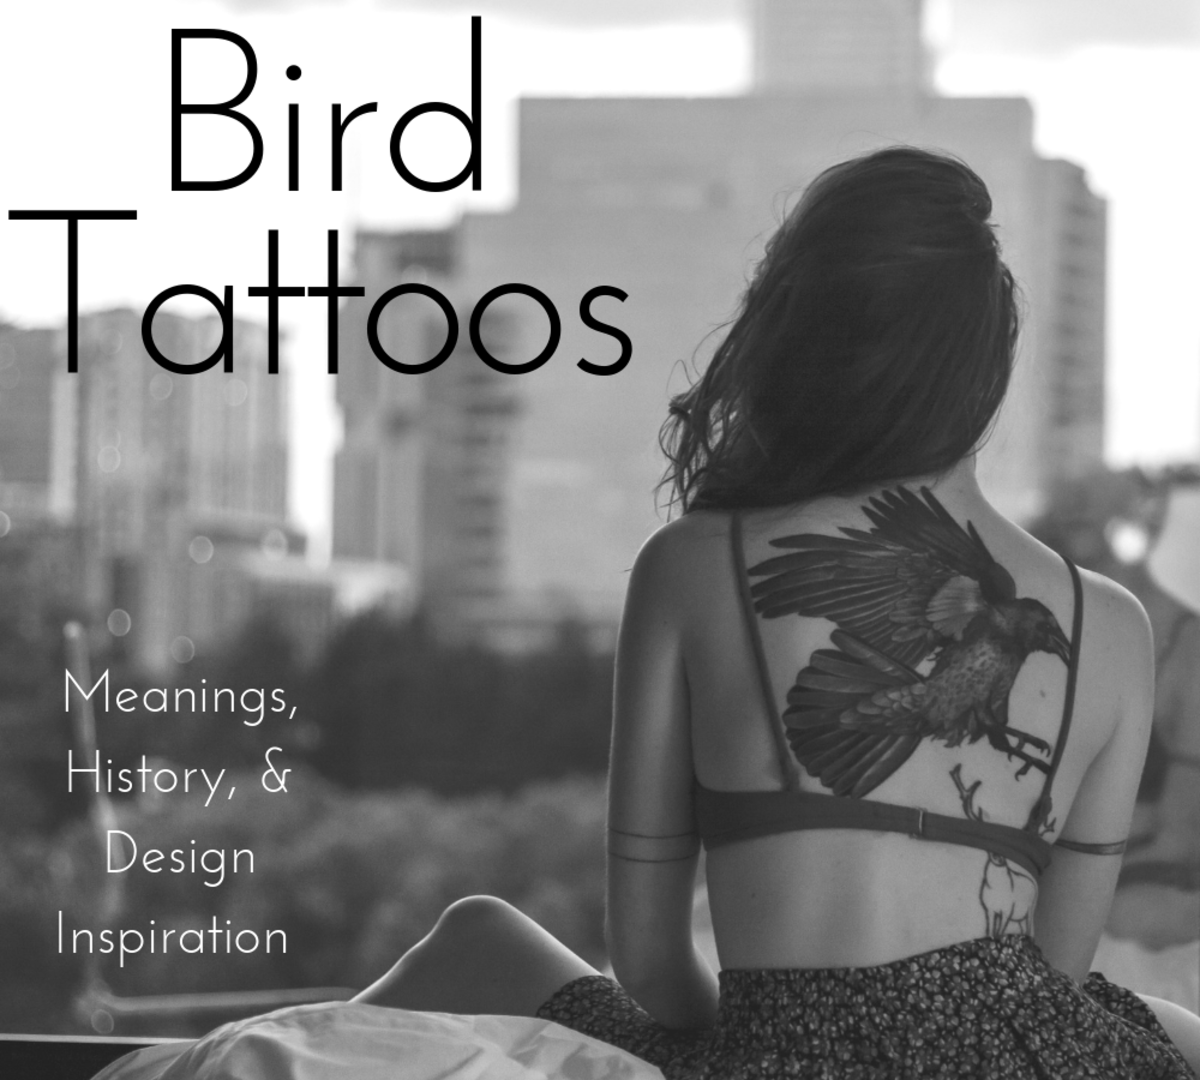 Bird Tattoos Interpreted: What Various Birds Mean & Represent